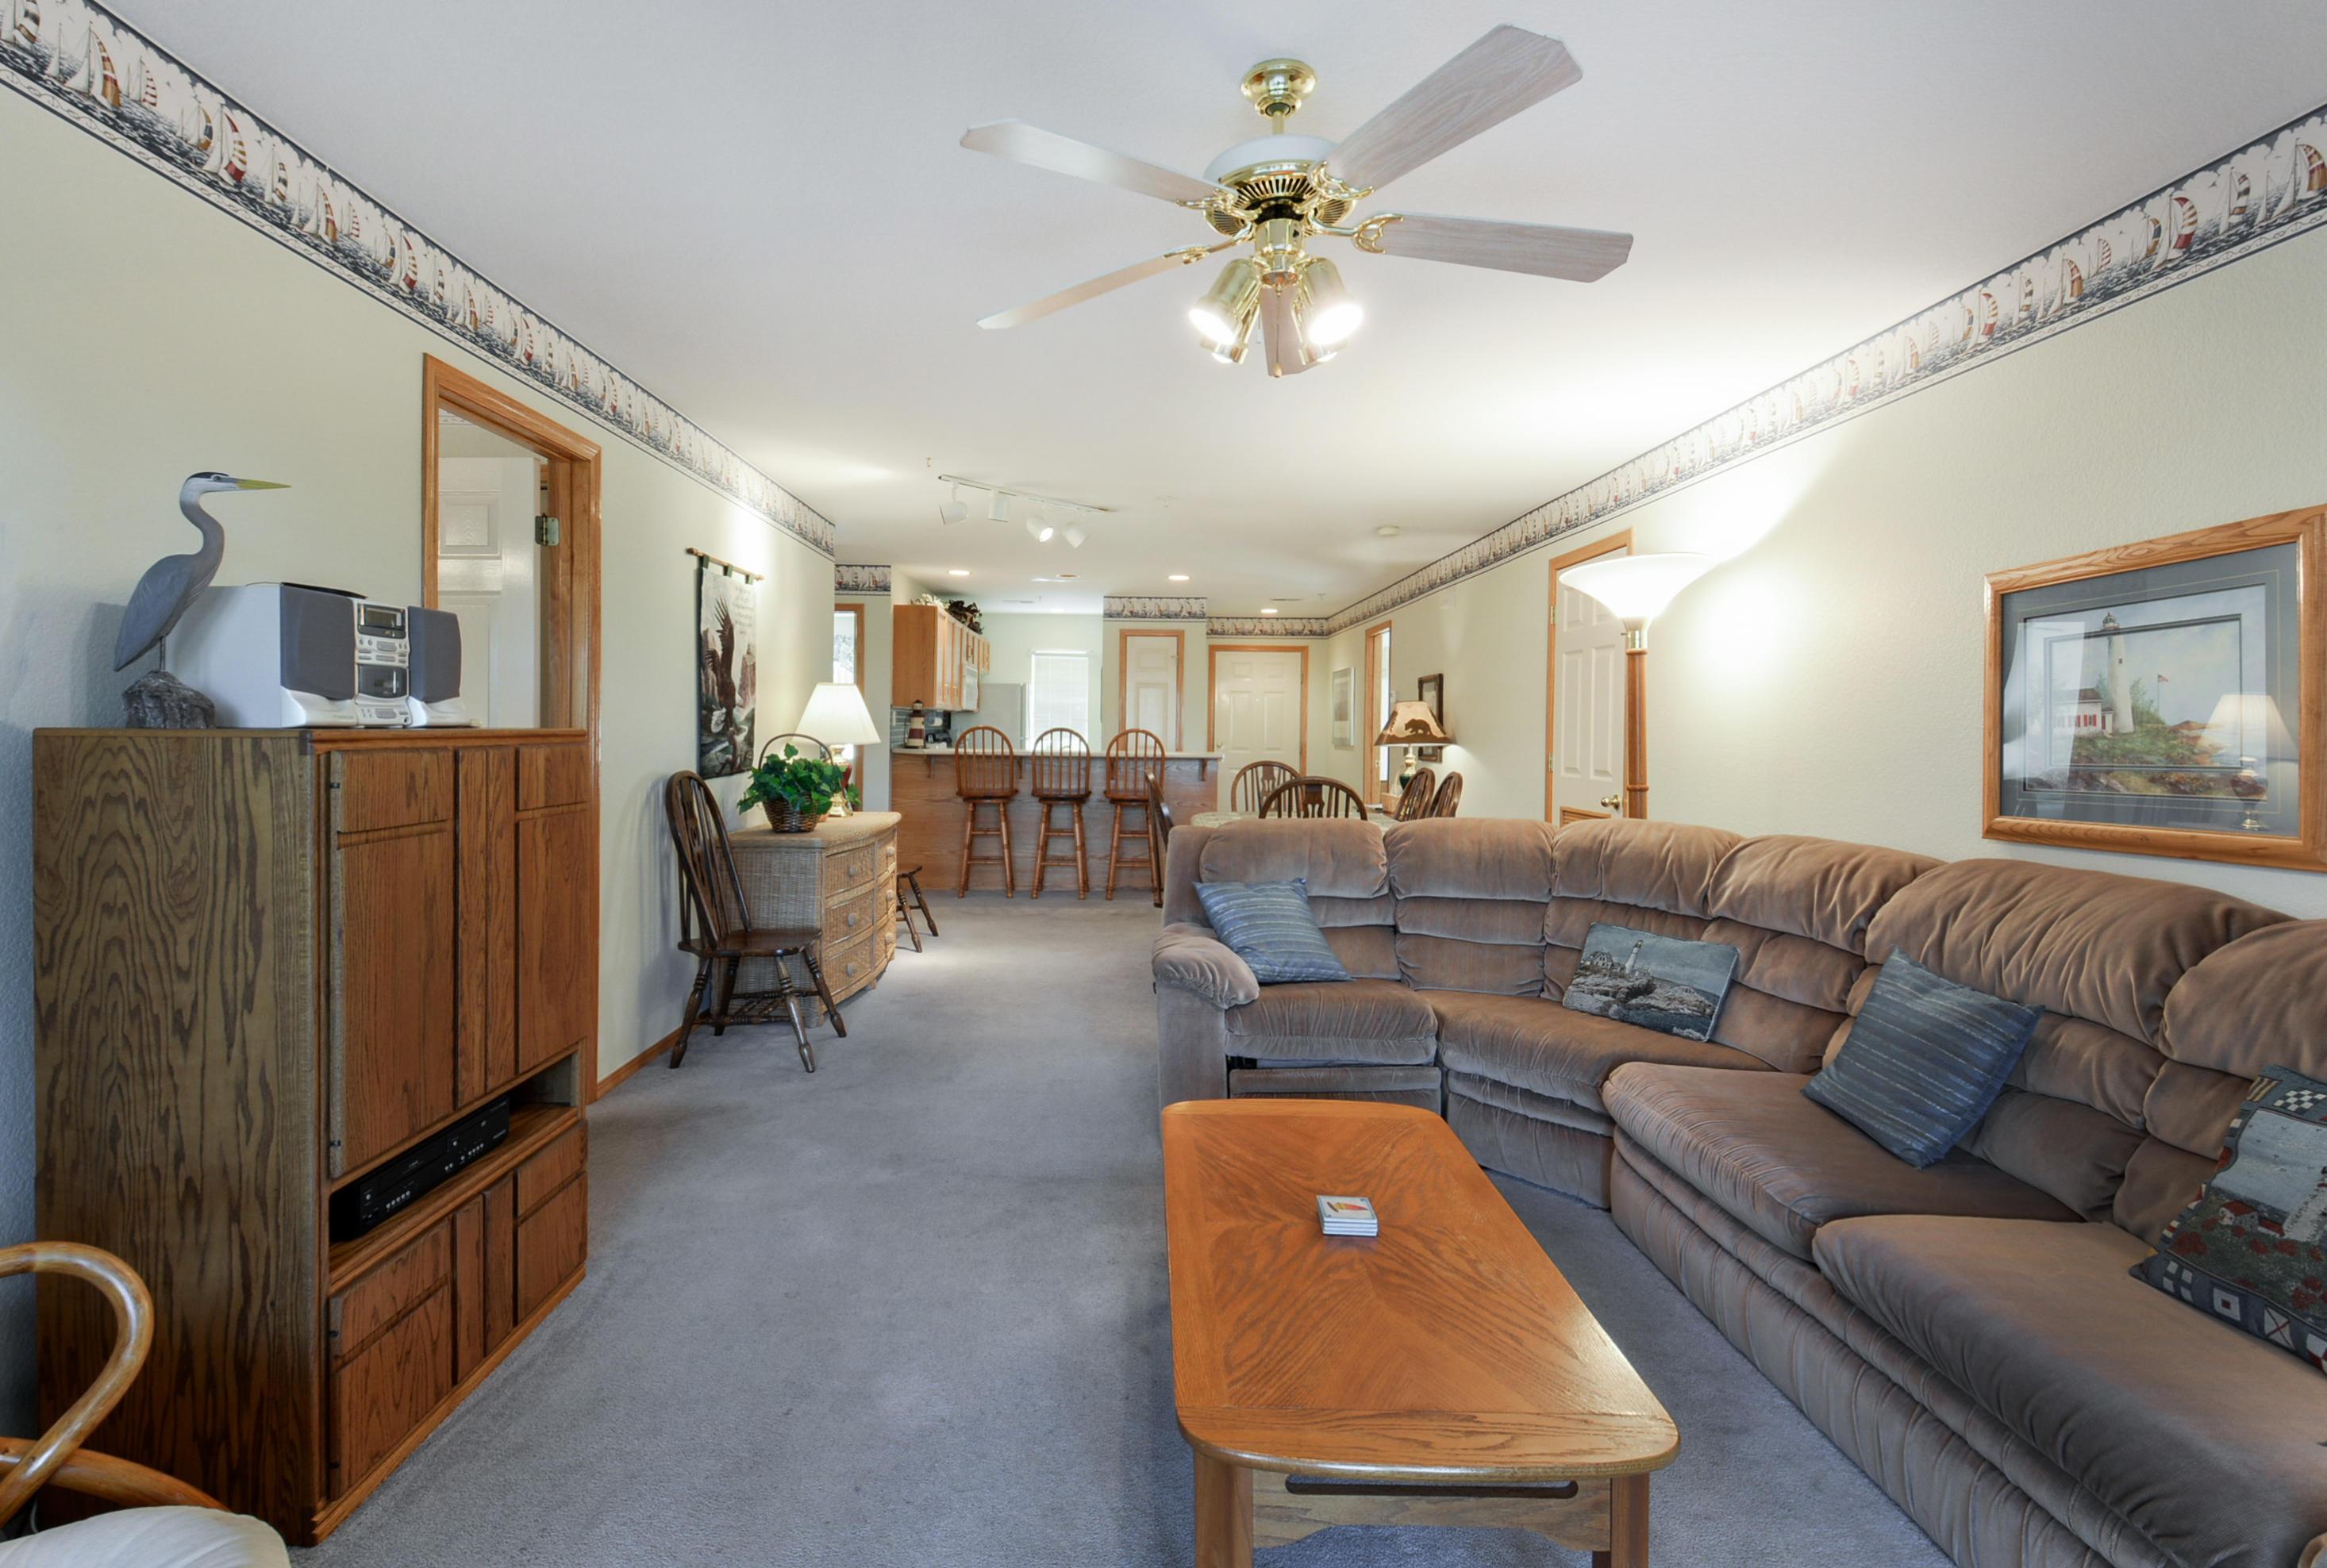 215 Lower Emerald Bay #6 Hollister, MO 65672